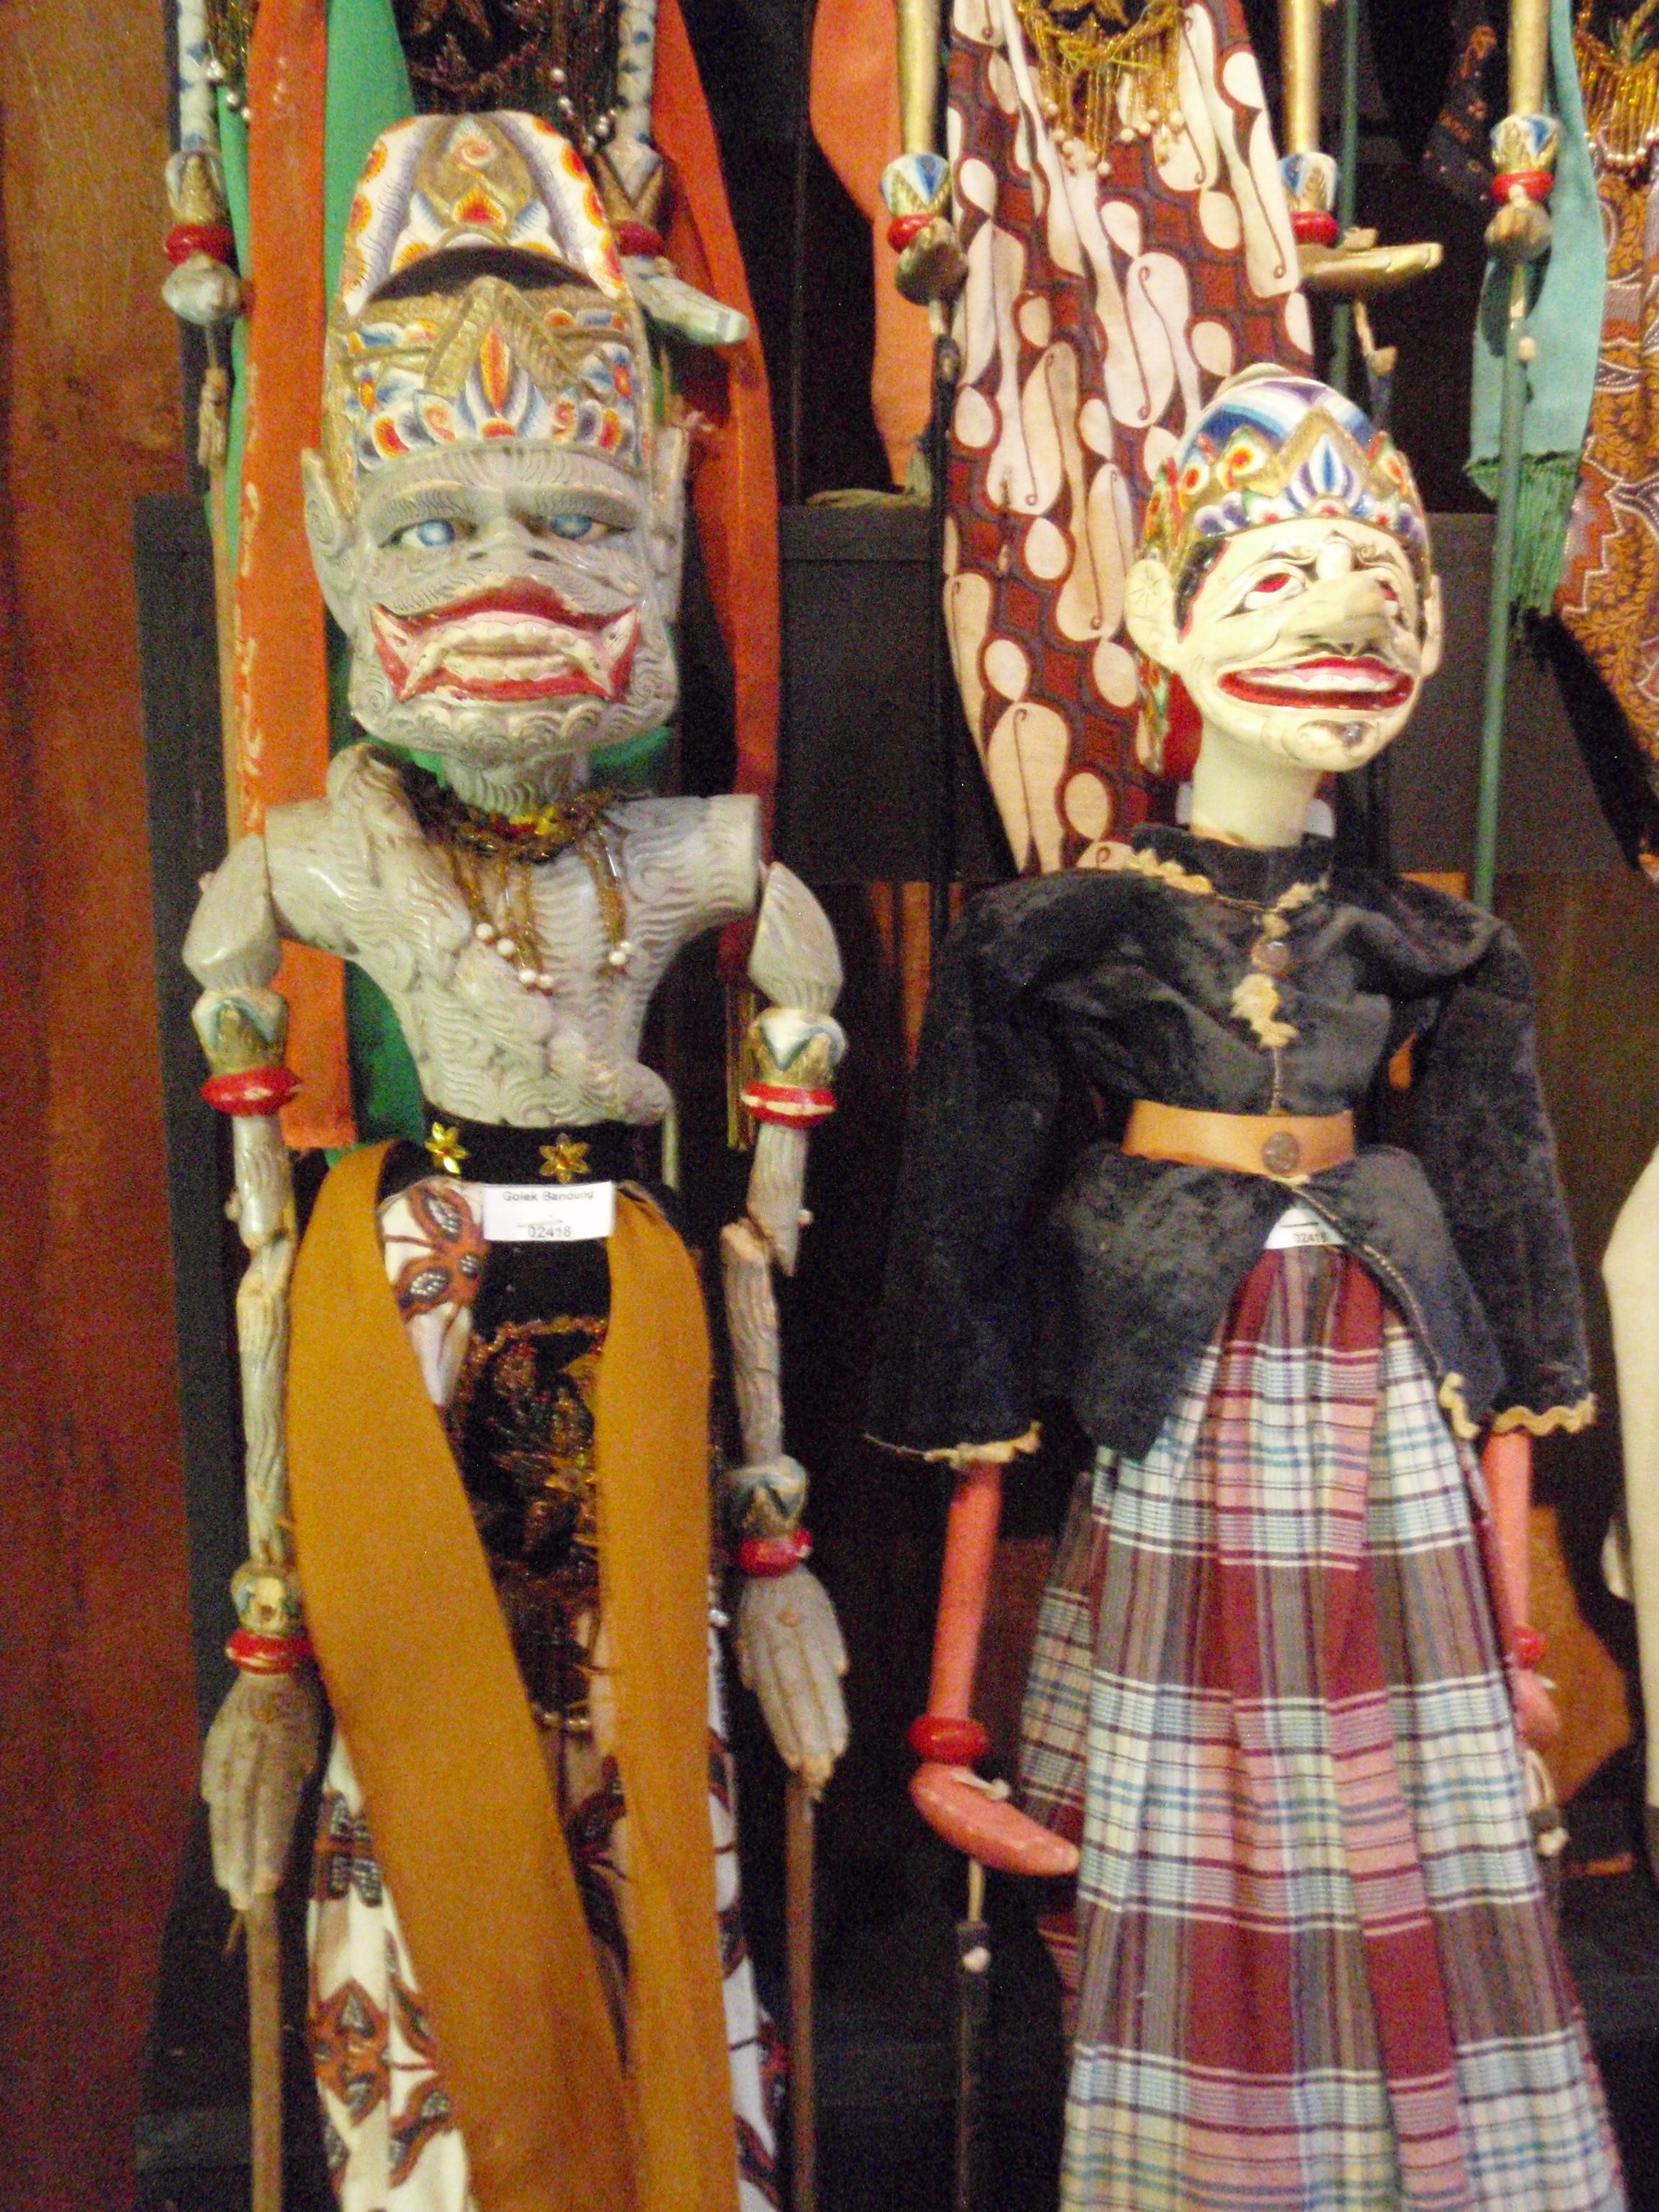 Hanoman (à droite) du Râmâyana, wayang golek purwa Bandung. Marionnettes à tiges.